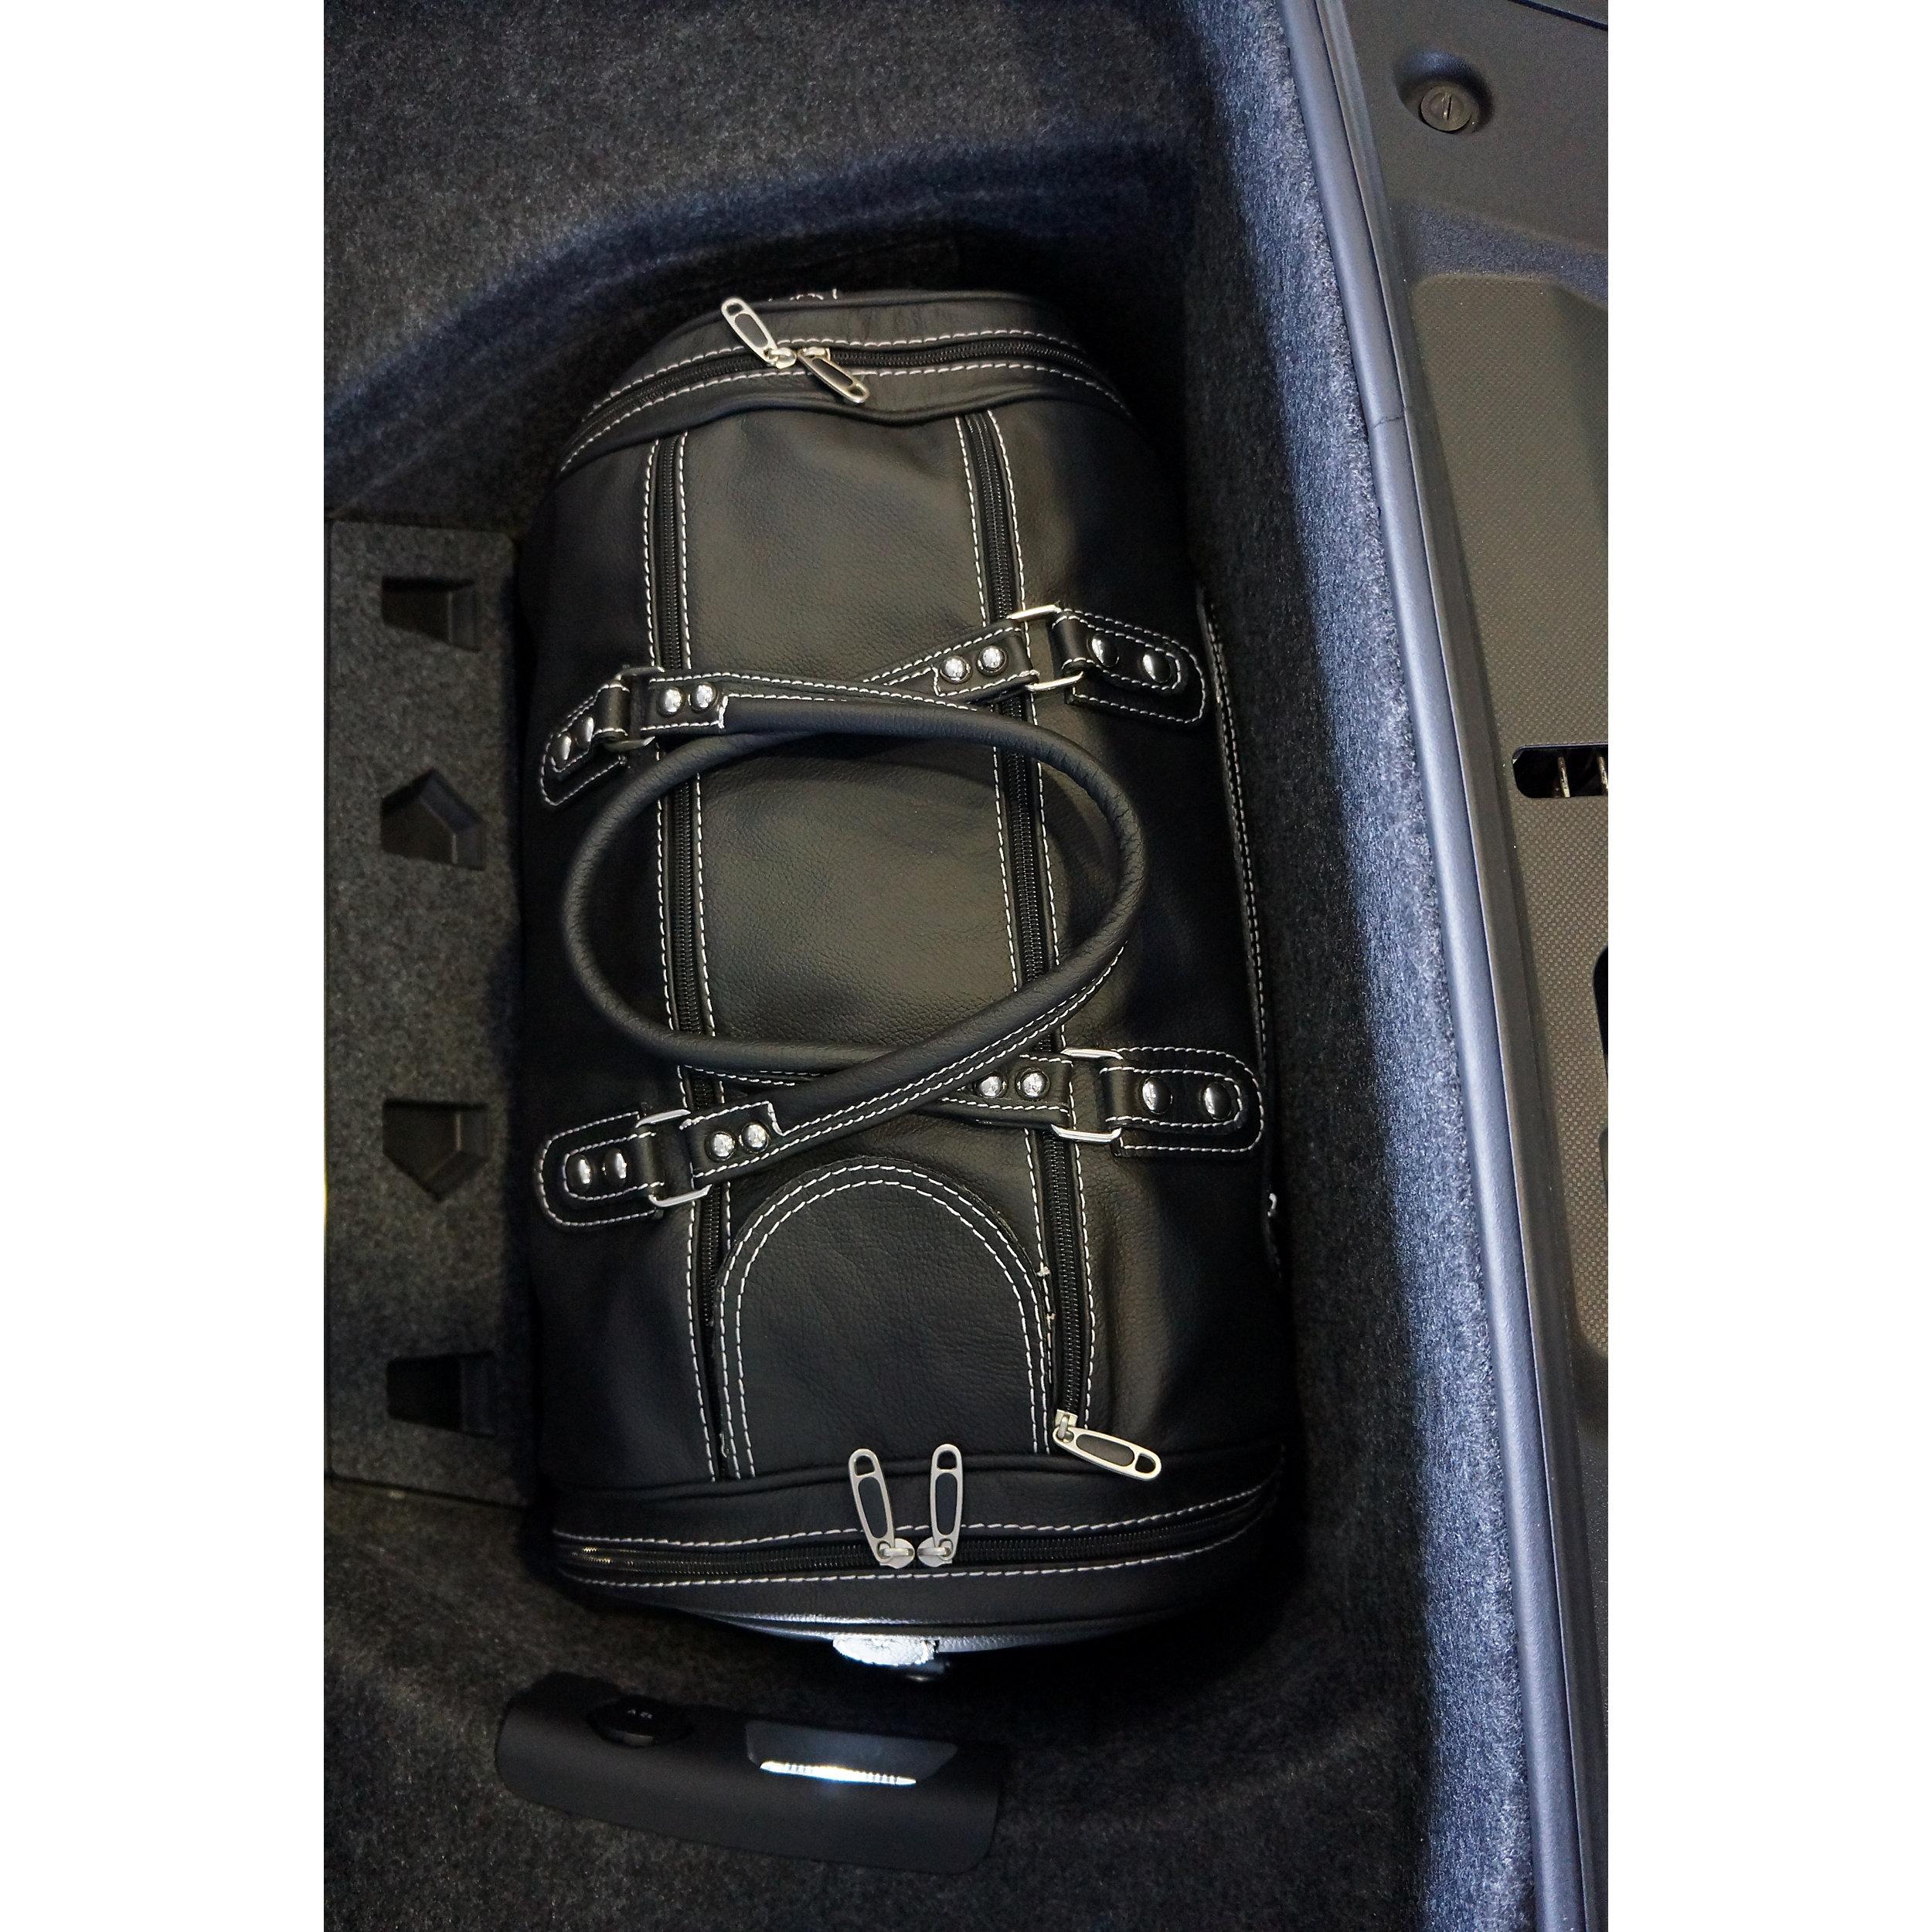 3-tlg. Kofferset Audi R8 Coupé 124 Liter